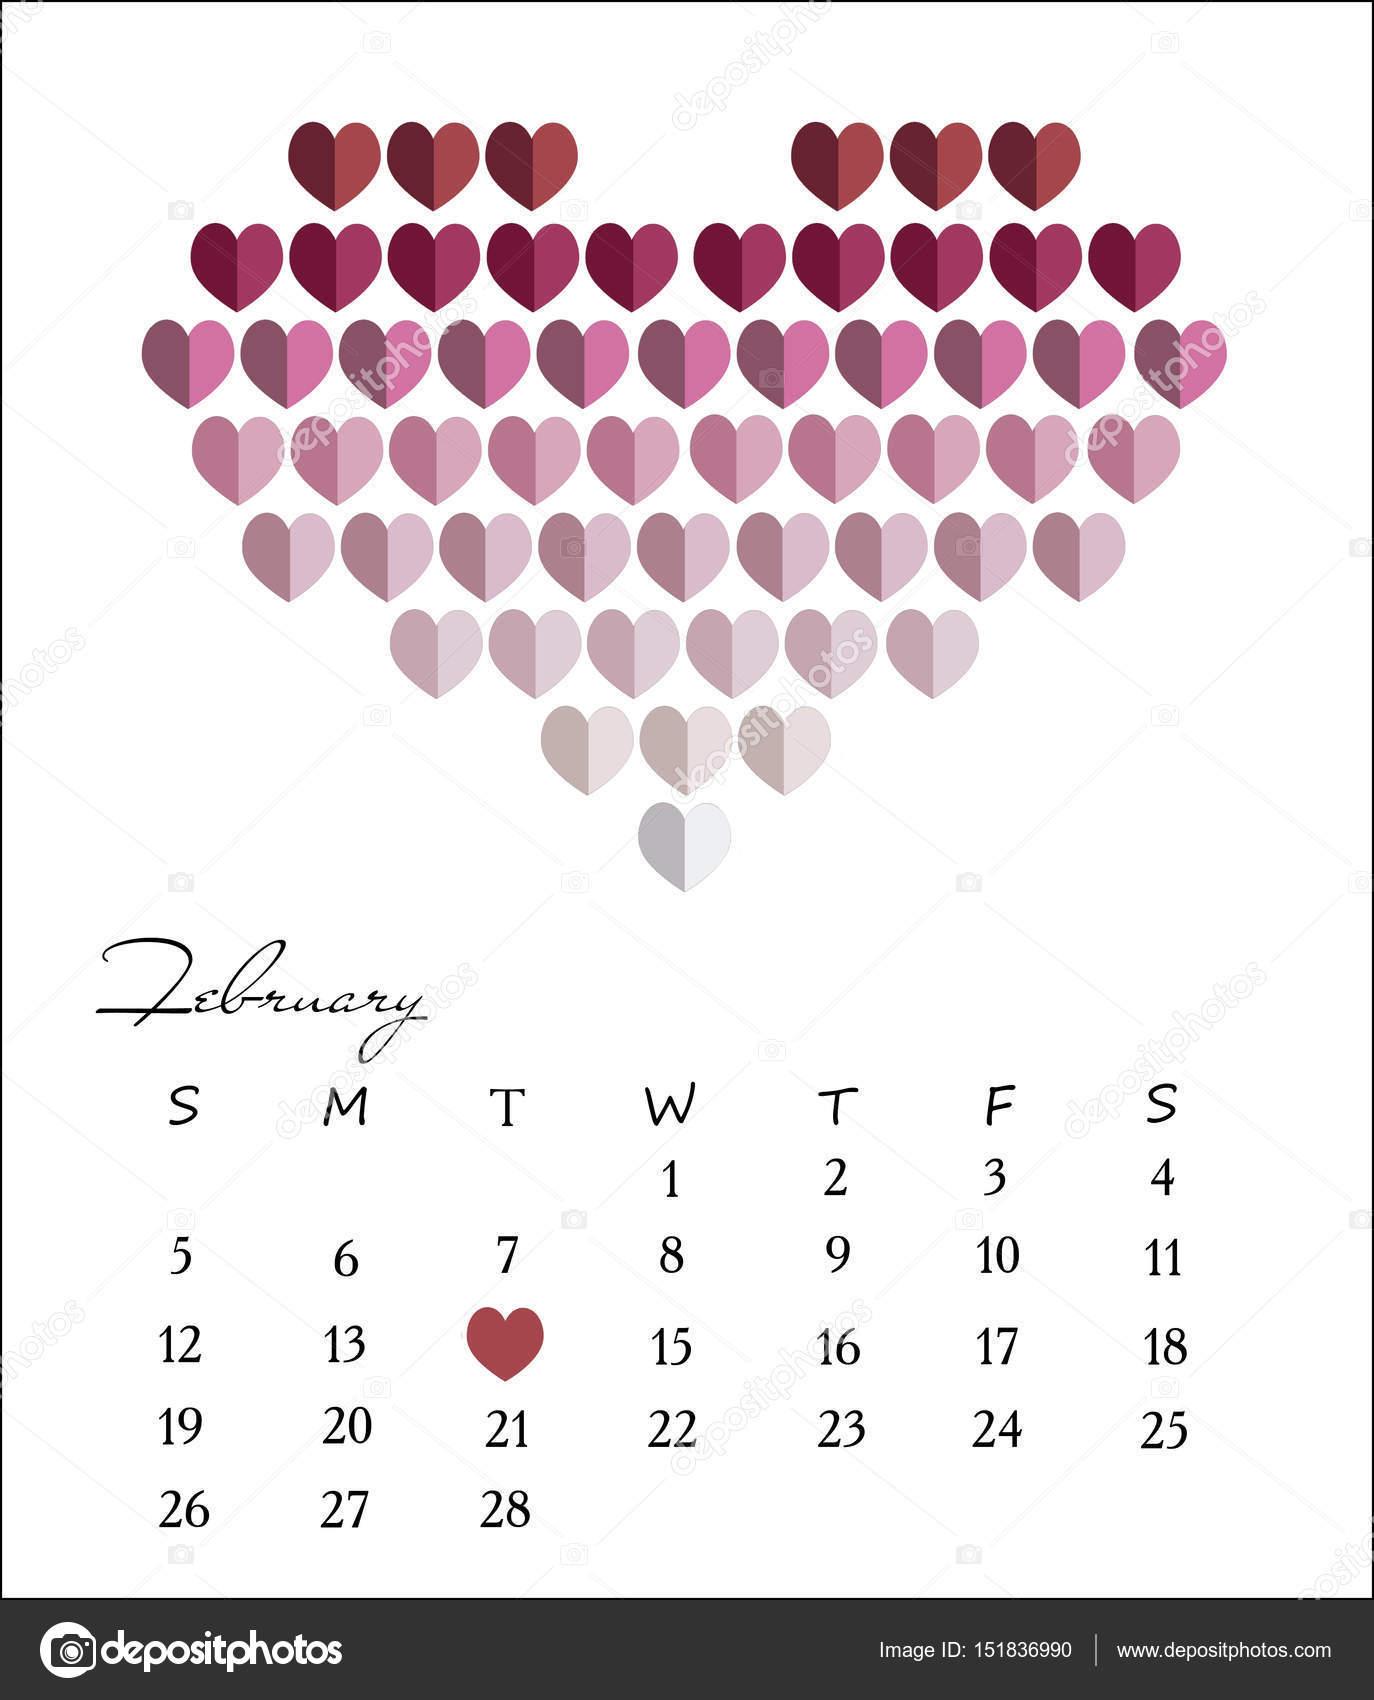 Februar 2017 Kalender Design. Schreibtisch-Kalendervorlage. Vektor ...